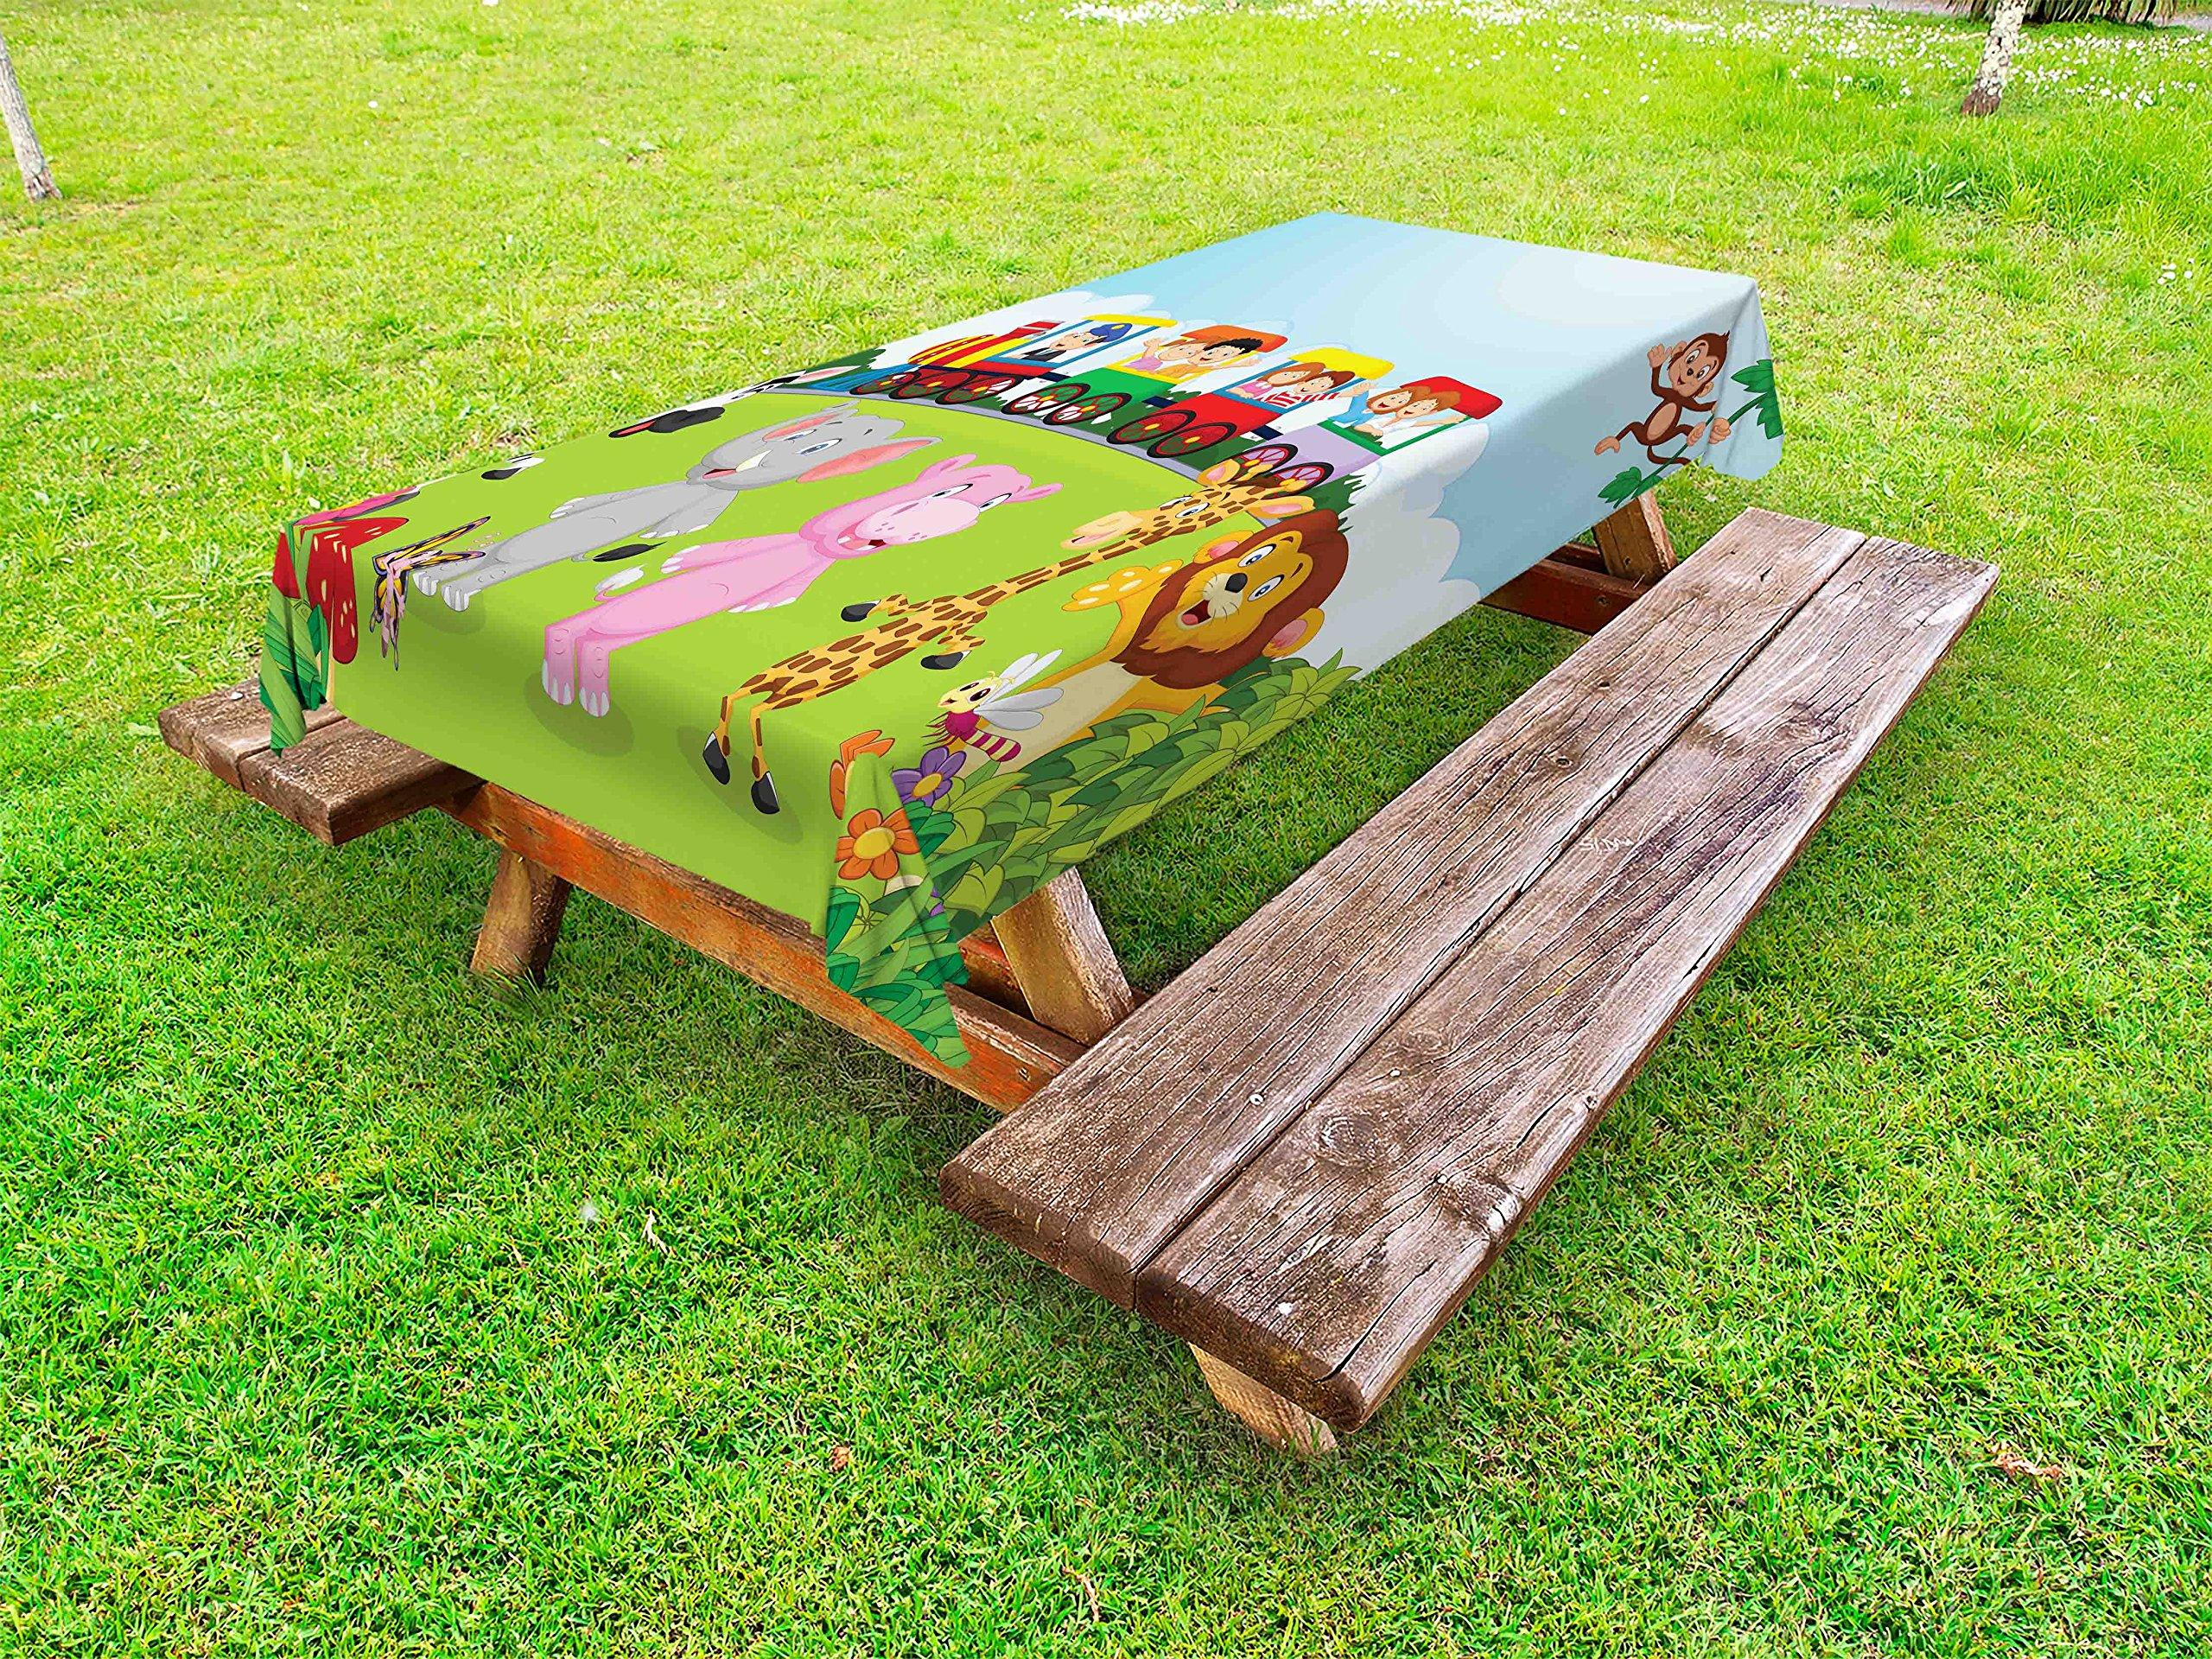 Ambesonne Cartoon Outdoor Tablecloth, Kids Nursery Design Happy Children on a Choo Choo Train with Safari Animals Artwork, Decorative Washable Picnic Table Cloth, 58 X 120 inches, Multicolor